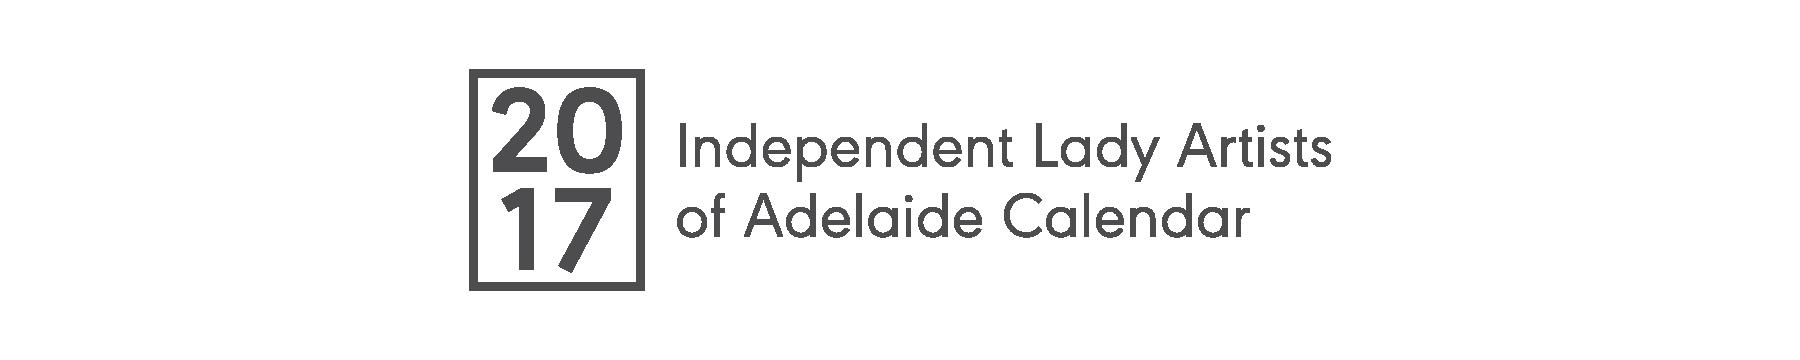 Lady Artists of Adelaide Calendar